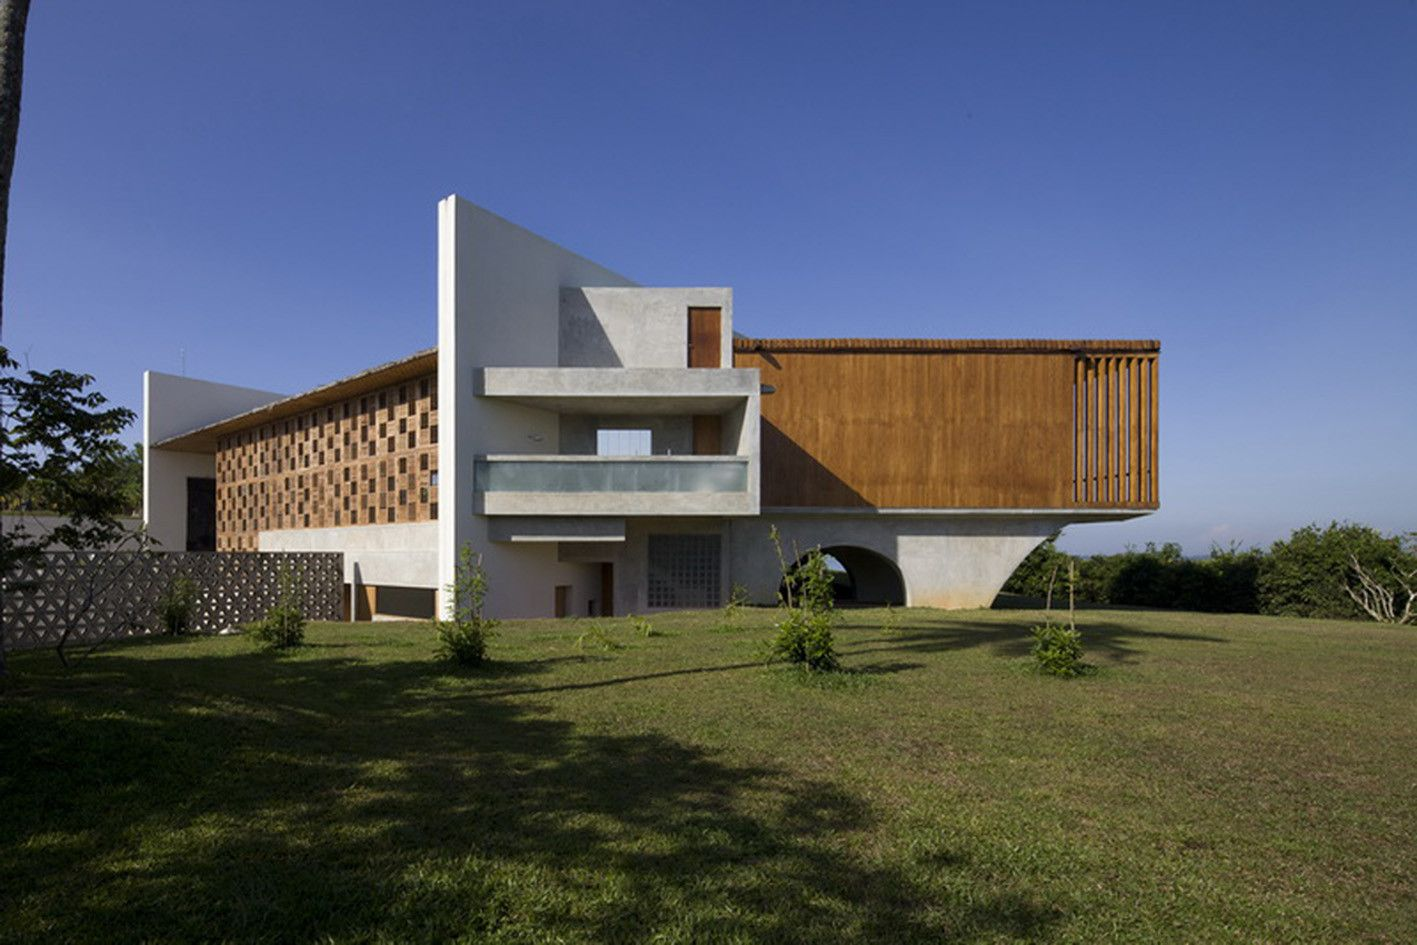 Galeria de Residência Vista / Shigeru Ban Architects - 1